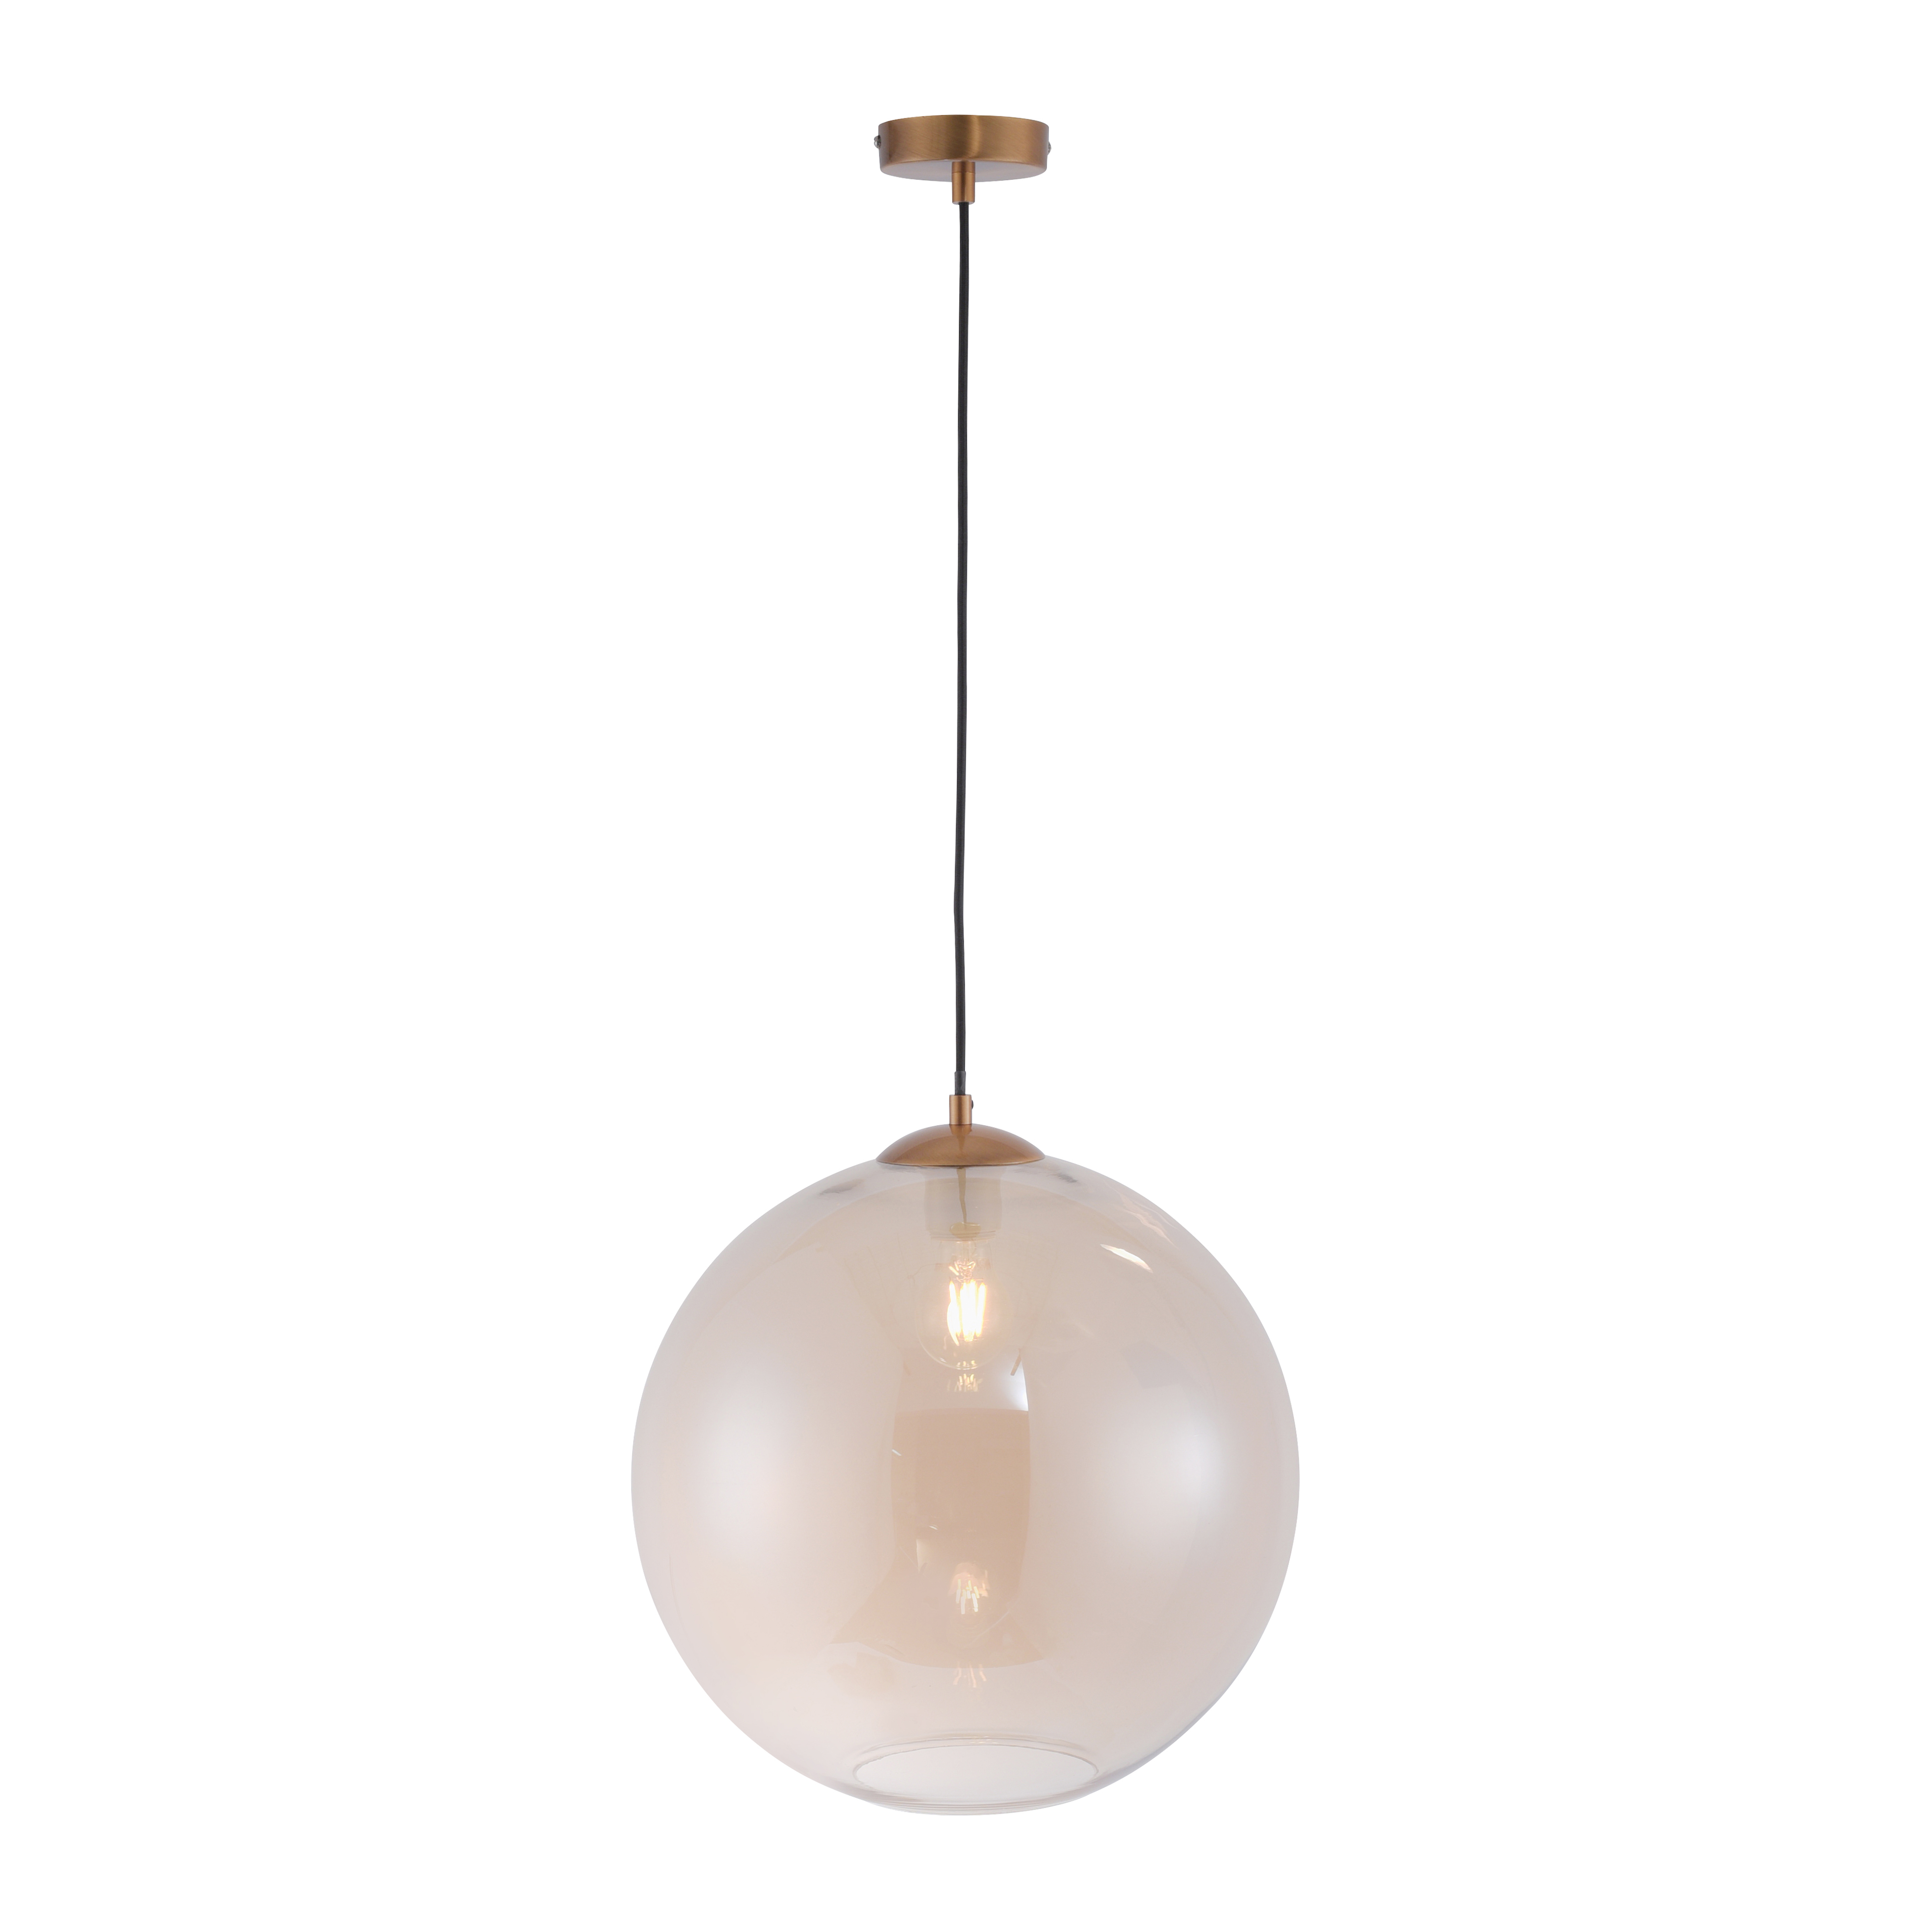 Art deco hanglamp messing met amber glas 40 cm - Pallot